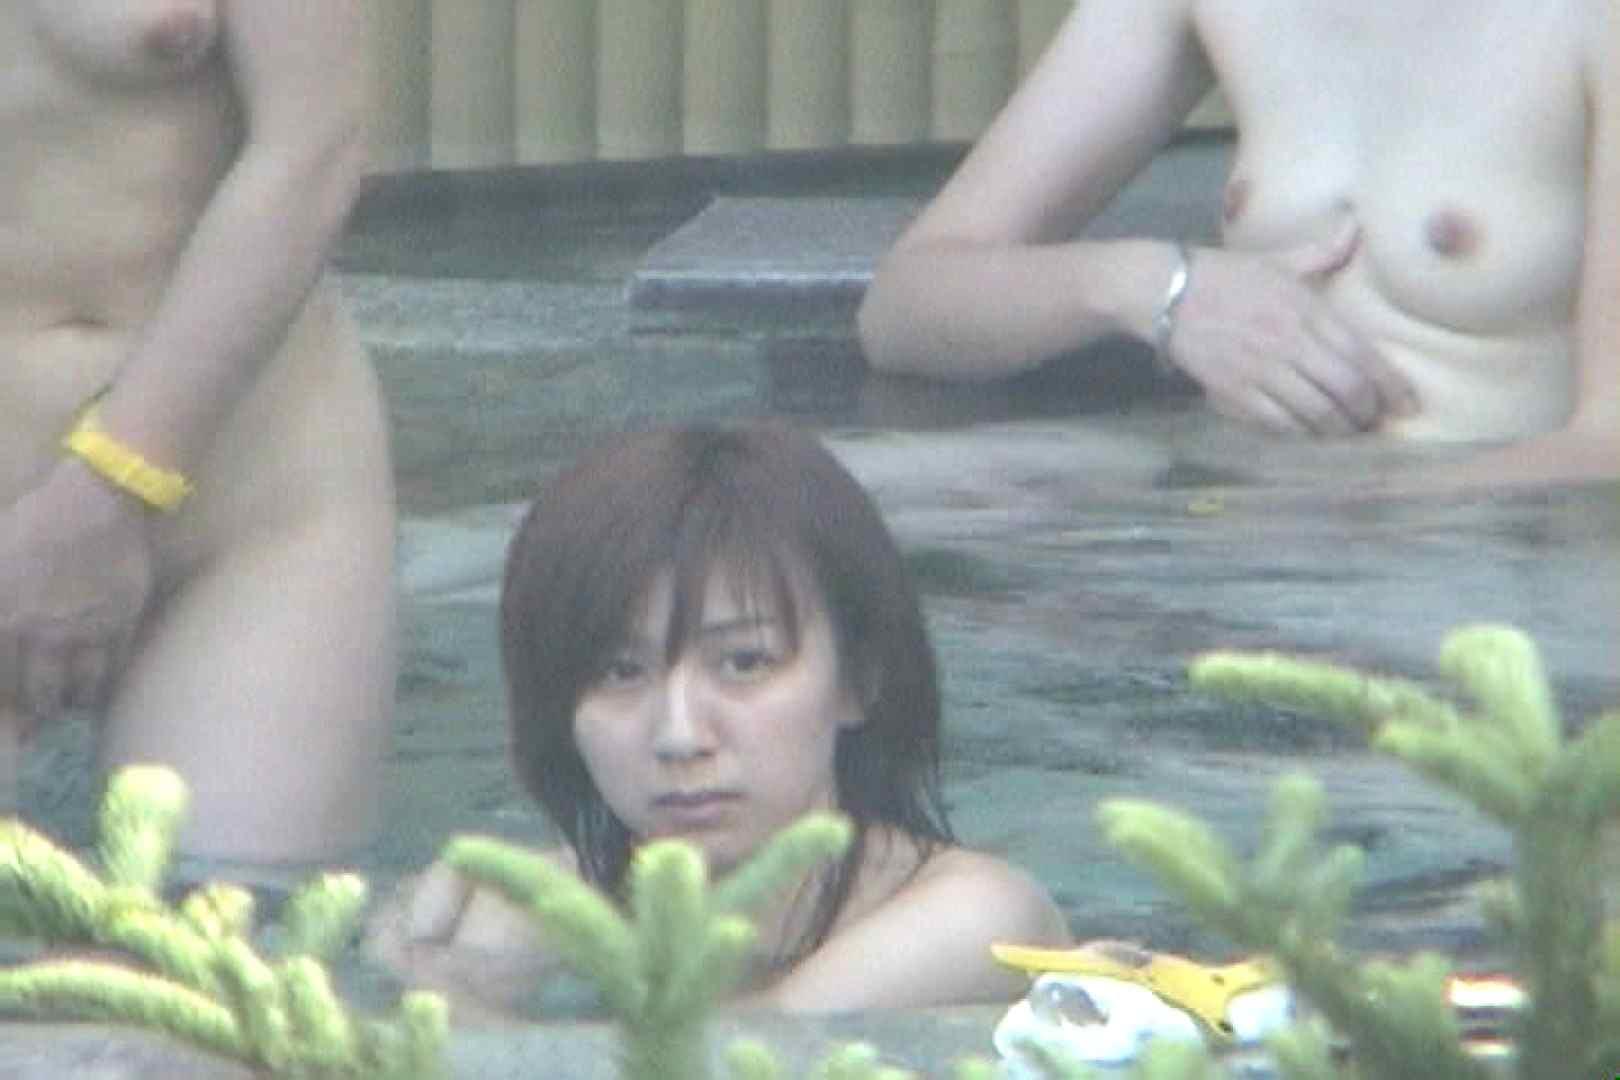 Aquaな露天風呂Vol.77【VIP限定】 盗撮   OLセックス  107画像 91